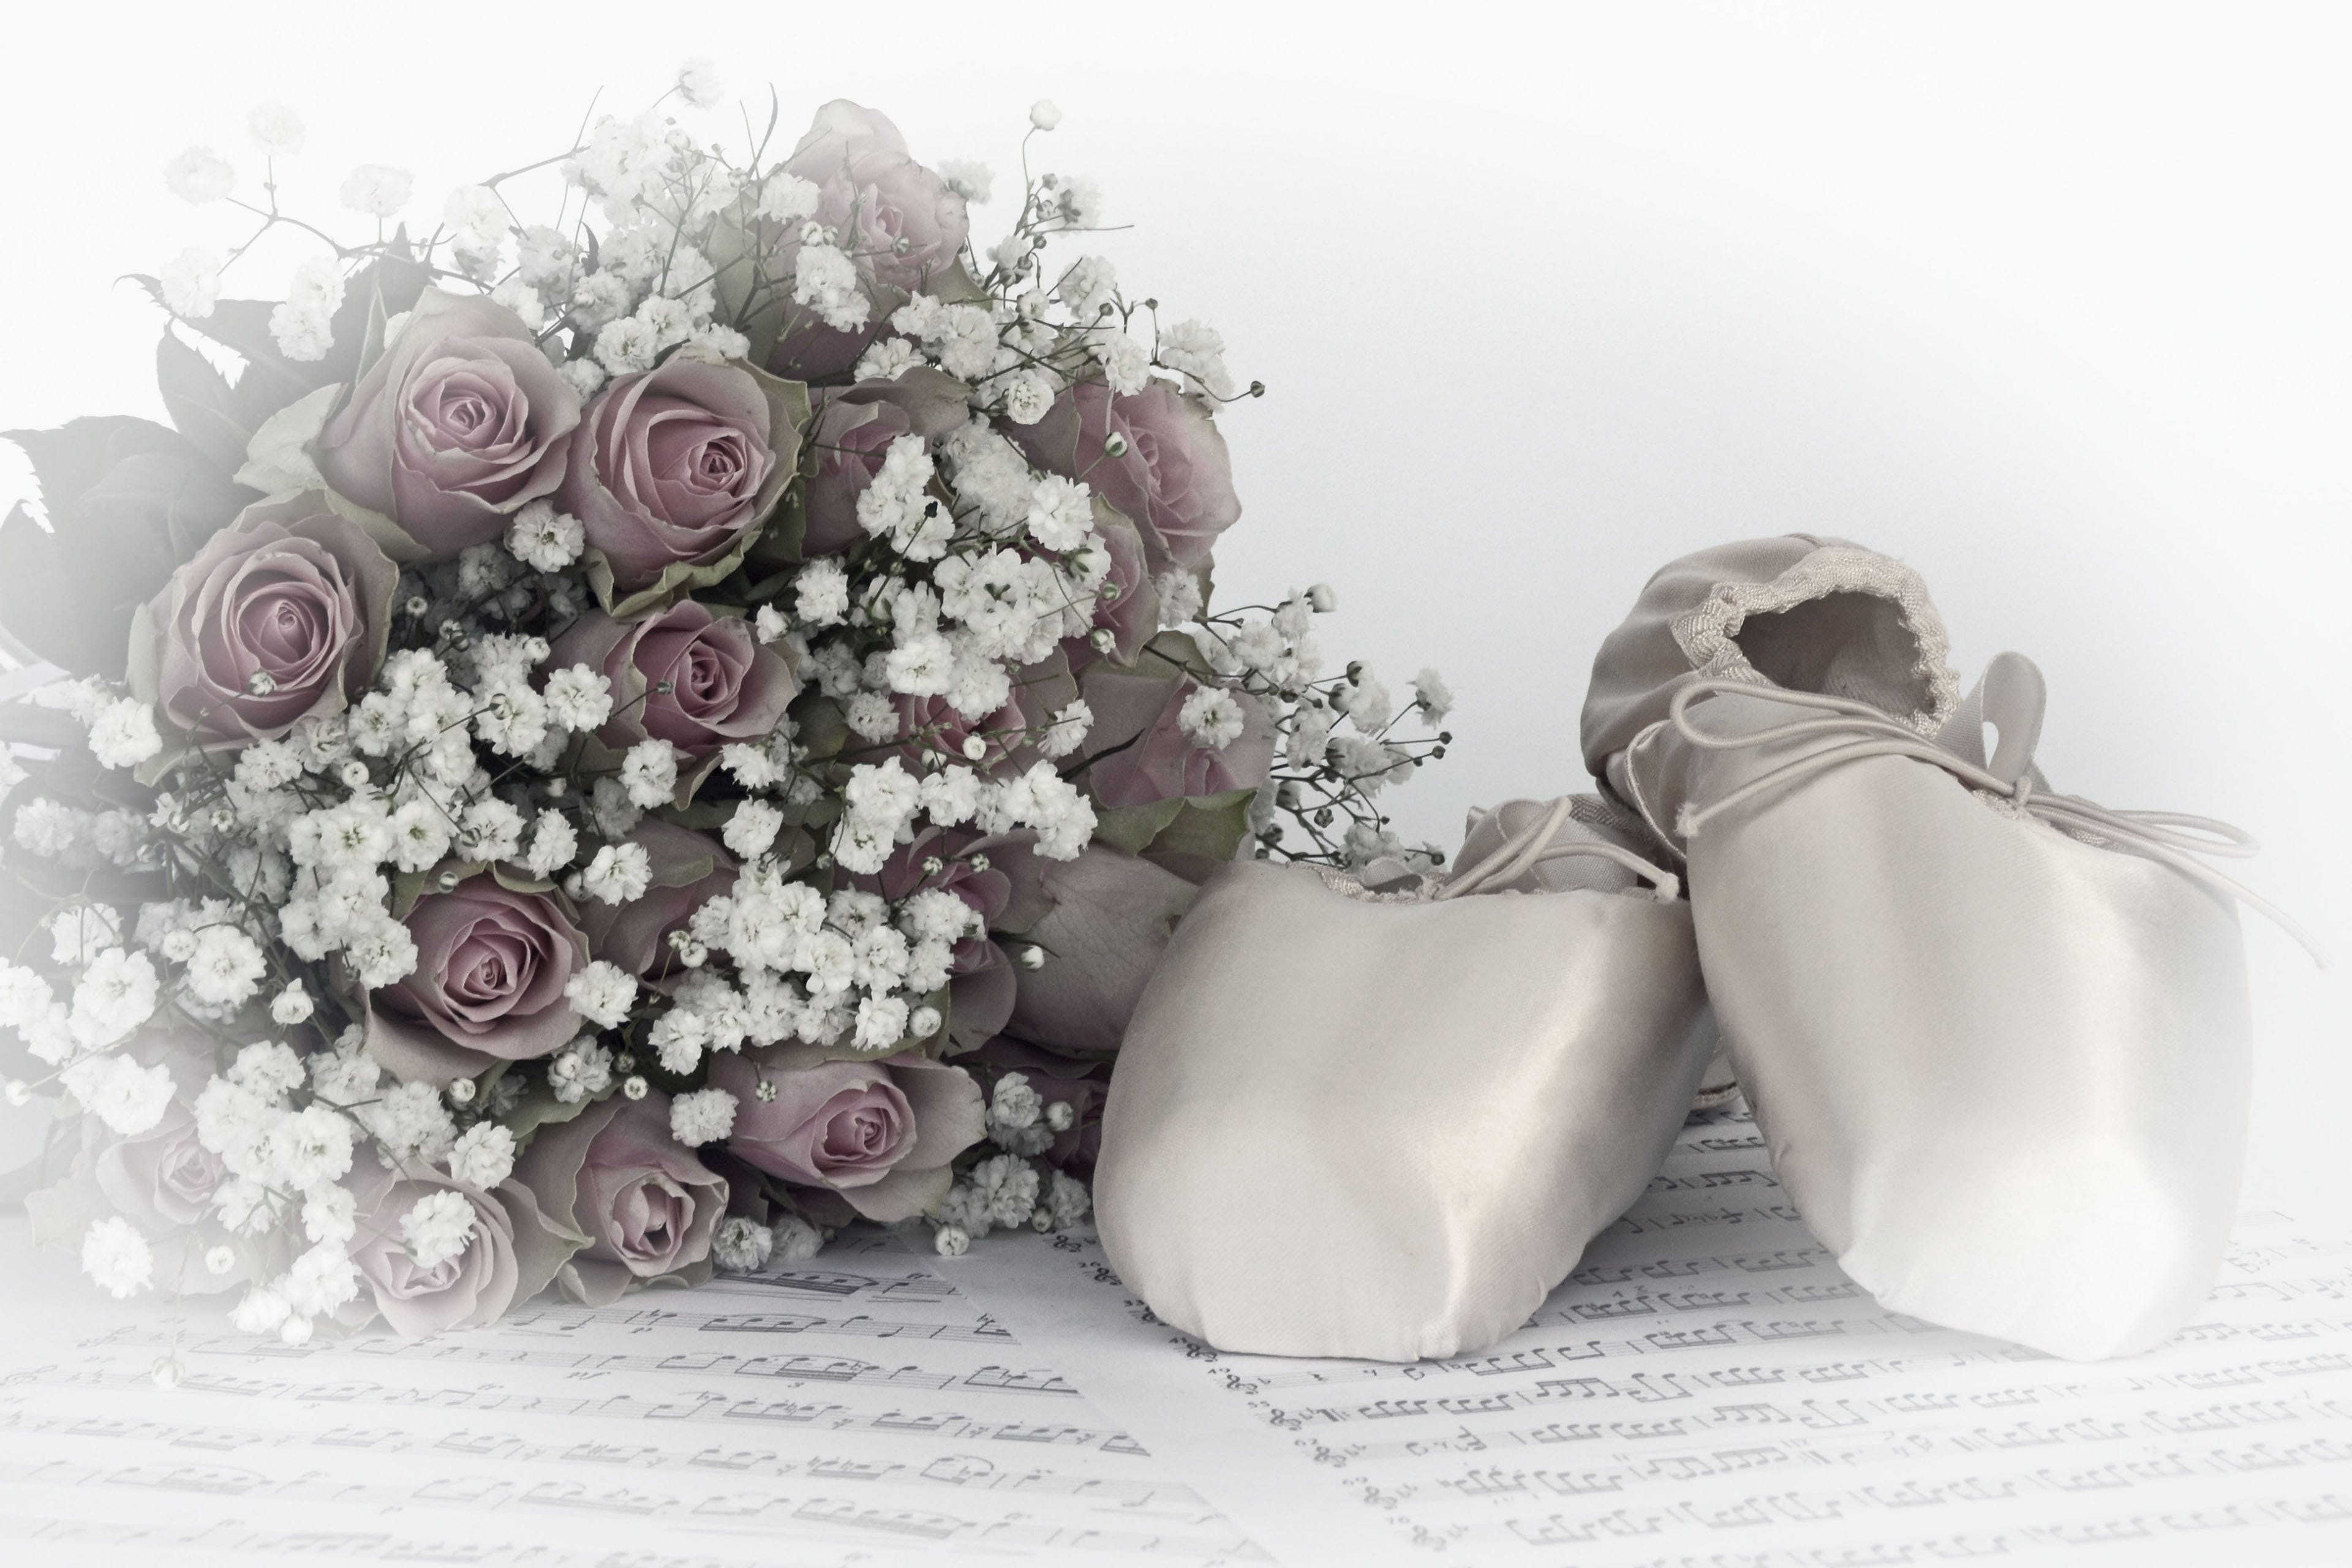 Free stock photo of flowers, music, roses, elegance